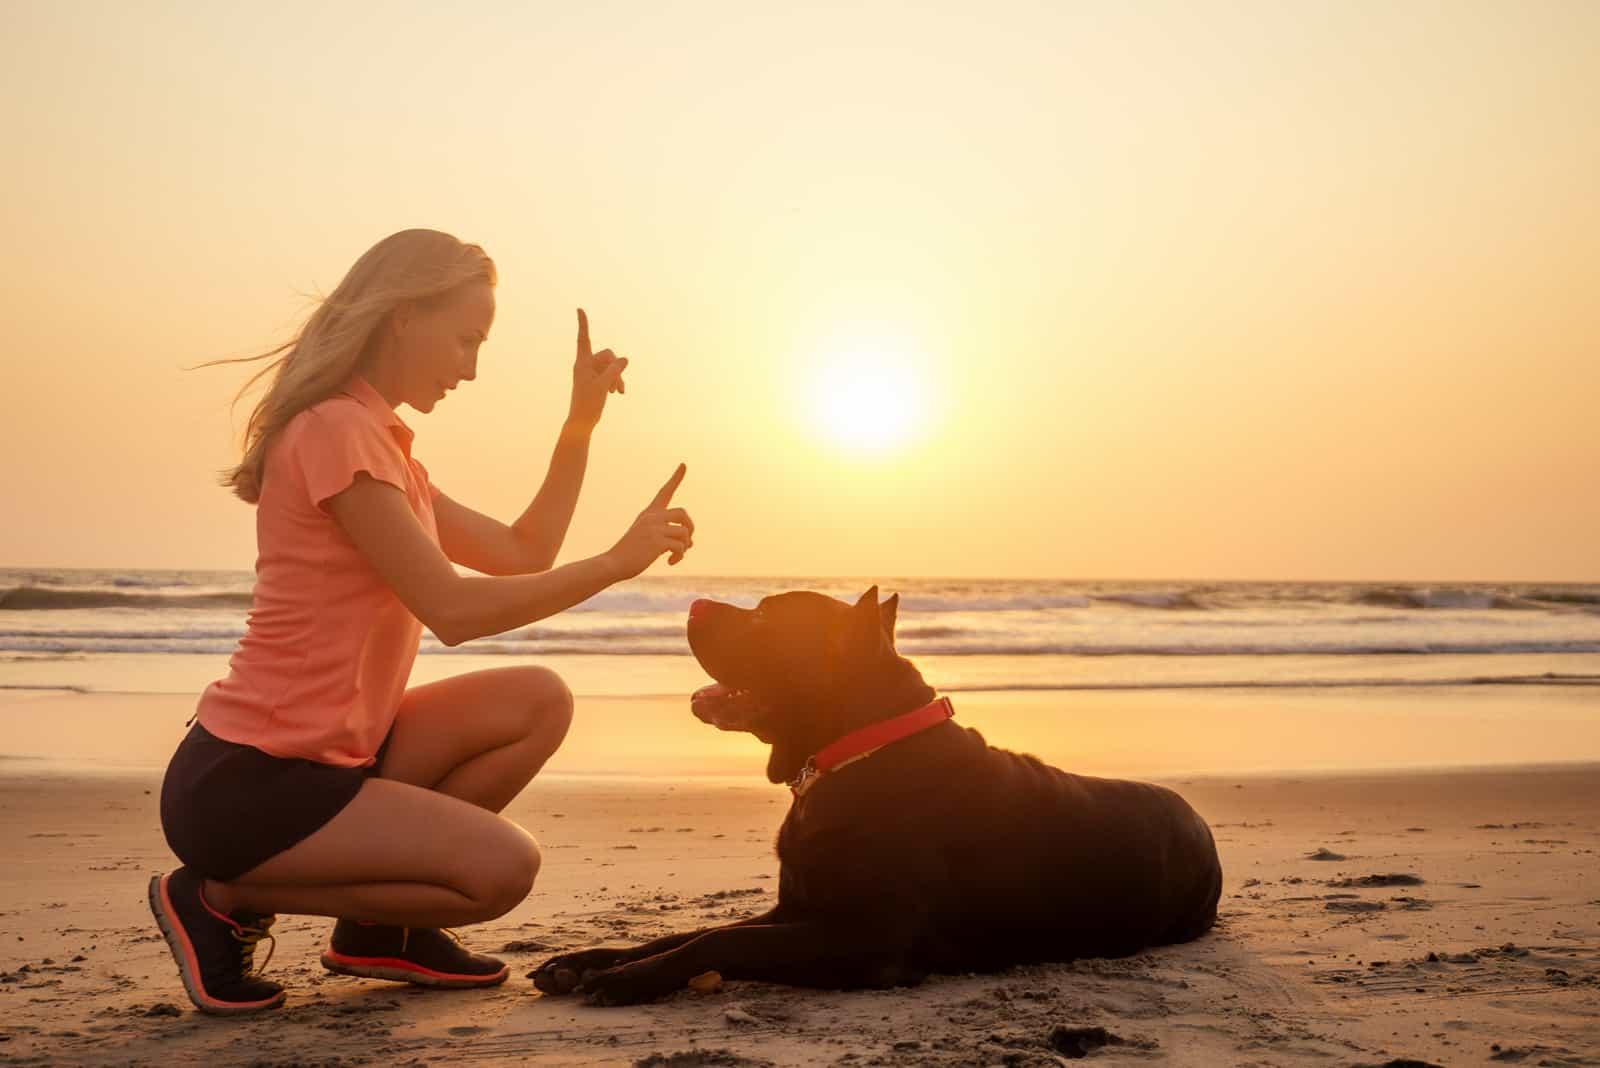 woman training Cane Corso dog at the beach